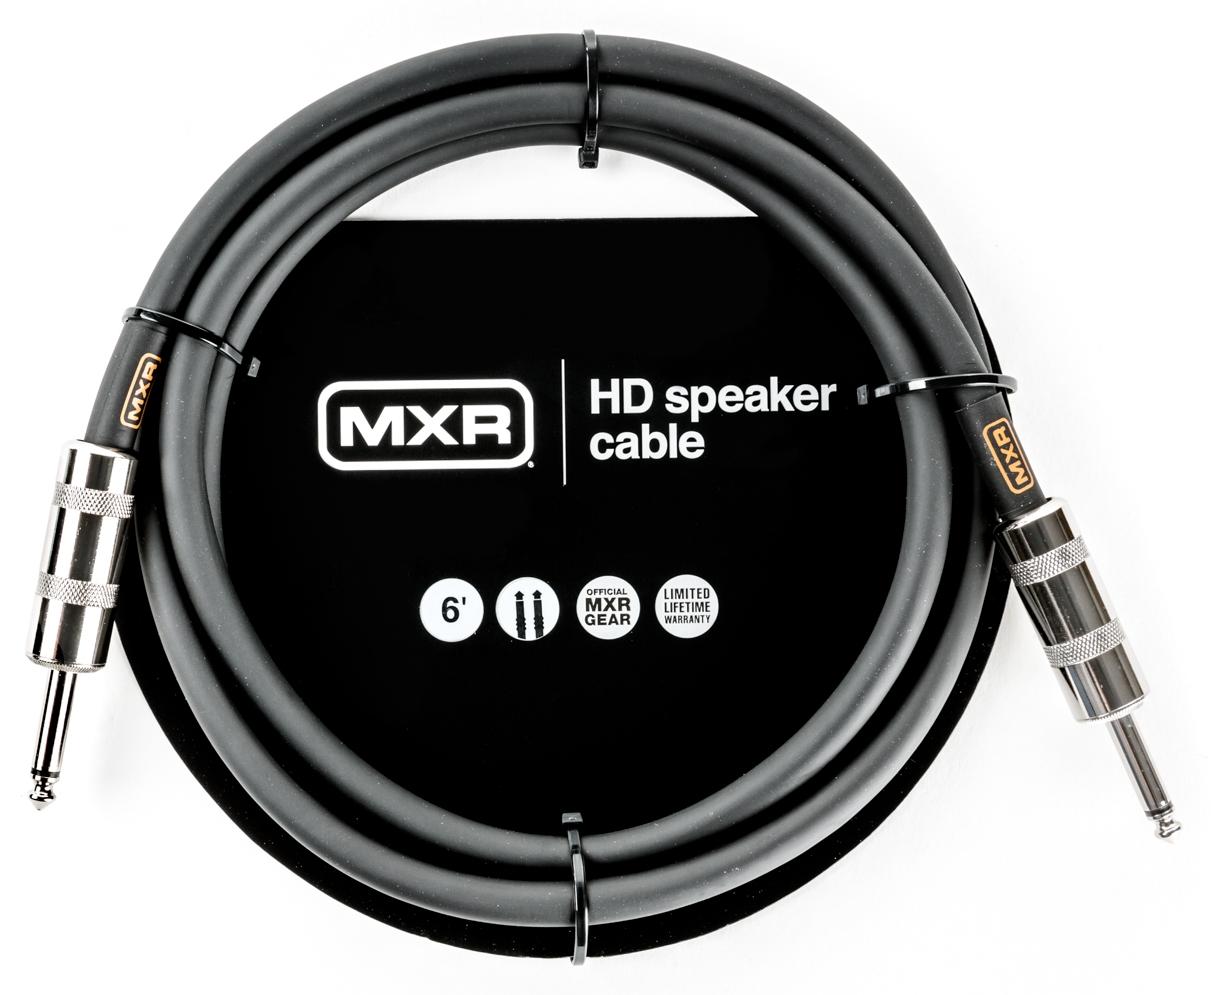 DUNLOP MXR Speaker Cable TS HD 6FT